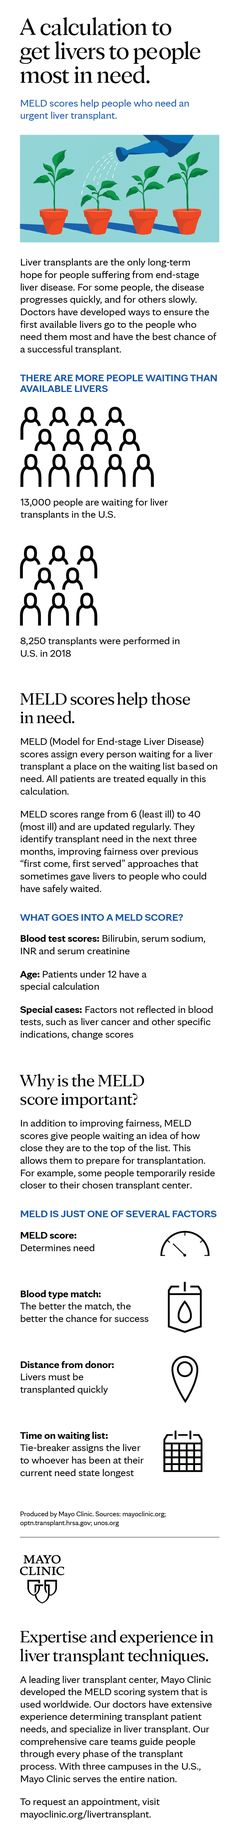 Mayo Clinic Mayoclinic On Pinterest